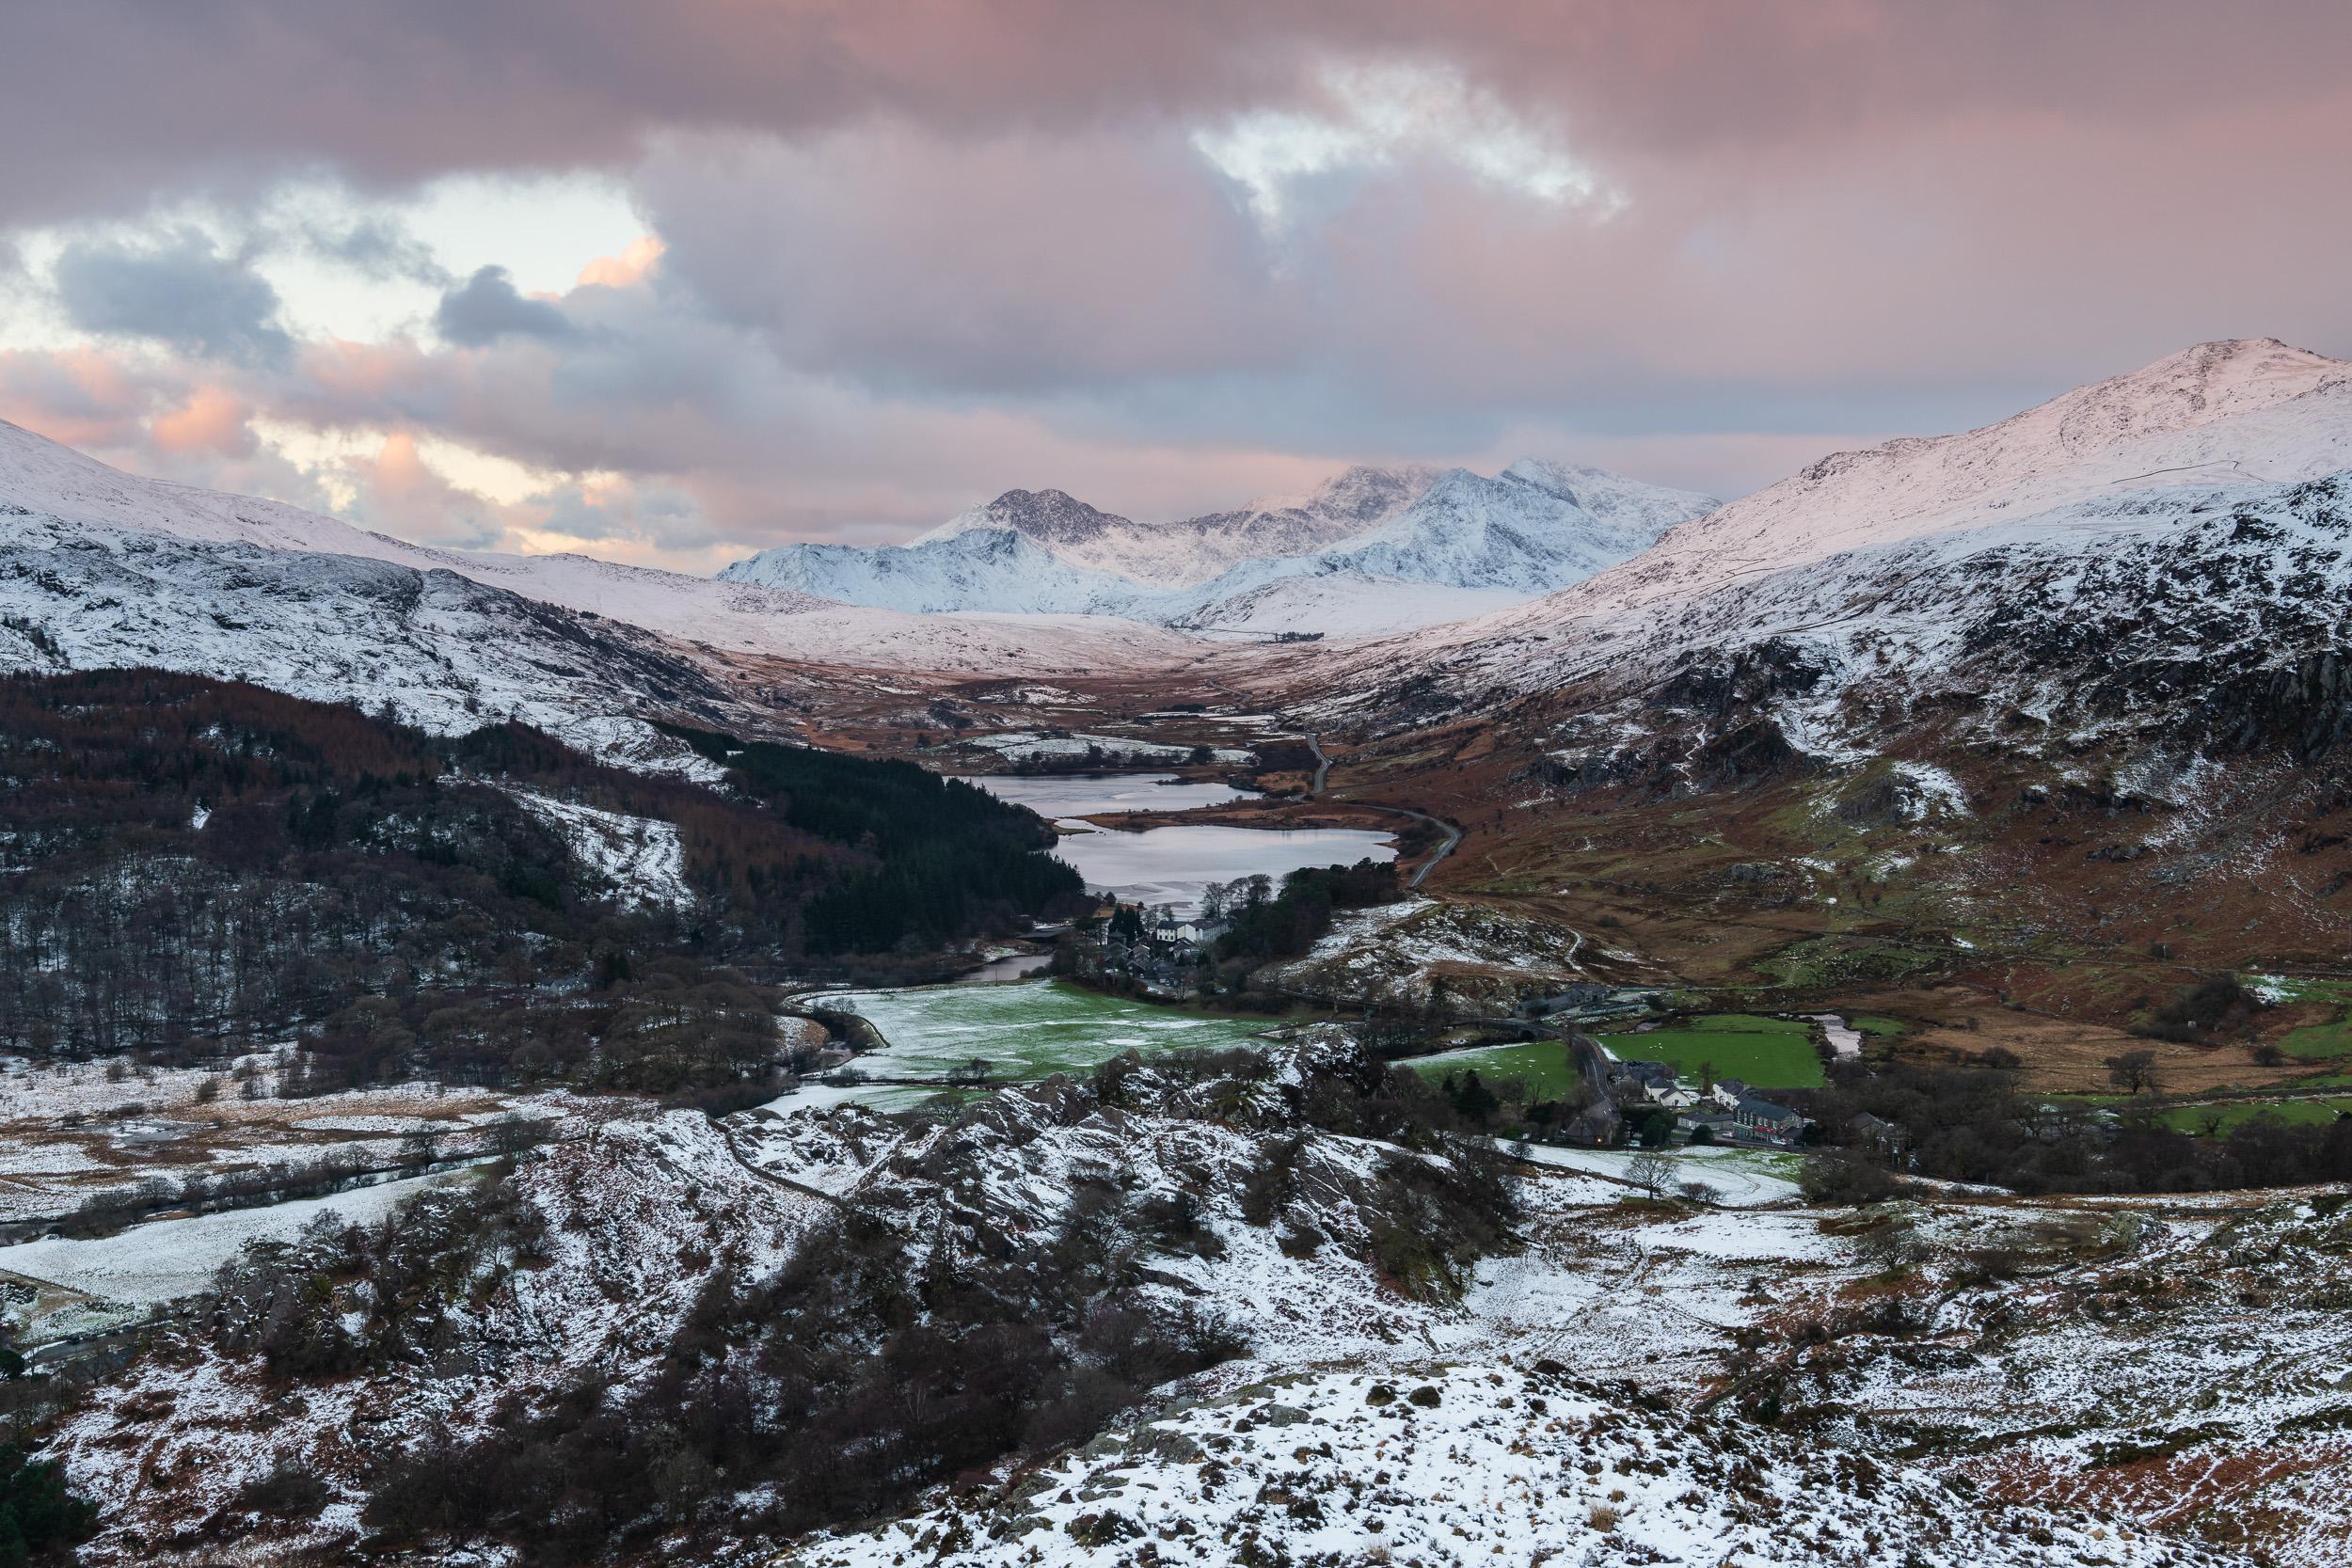 Snowdon from Clogwyn Mawr, Capel Curig, Snowdonia National Park  - Nikon D850, Nikkor 24-70 mm f/2.8 VR at 36 mm, f/11, 1/2 sec at ISO 64, polariser and ND grad.